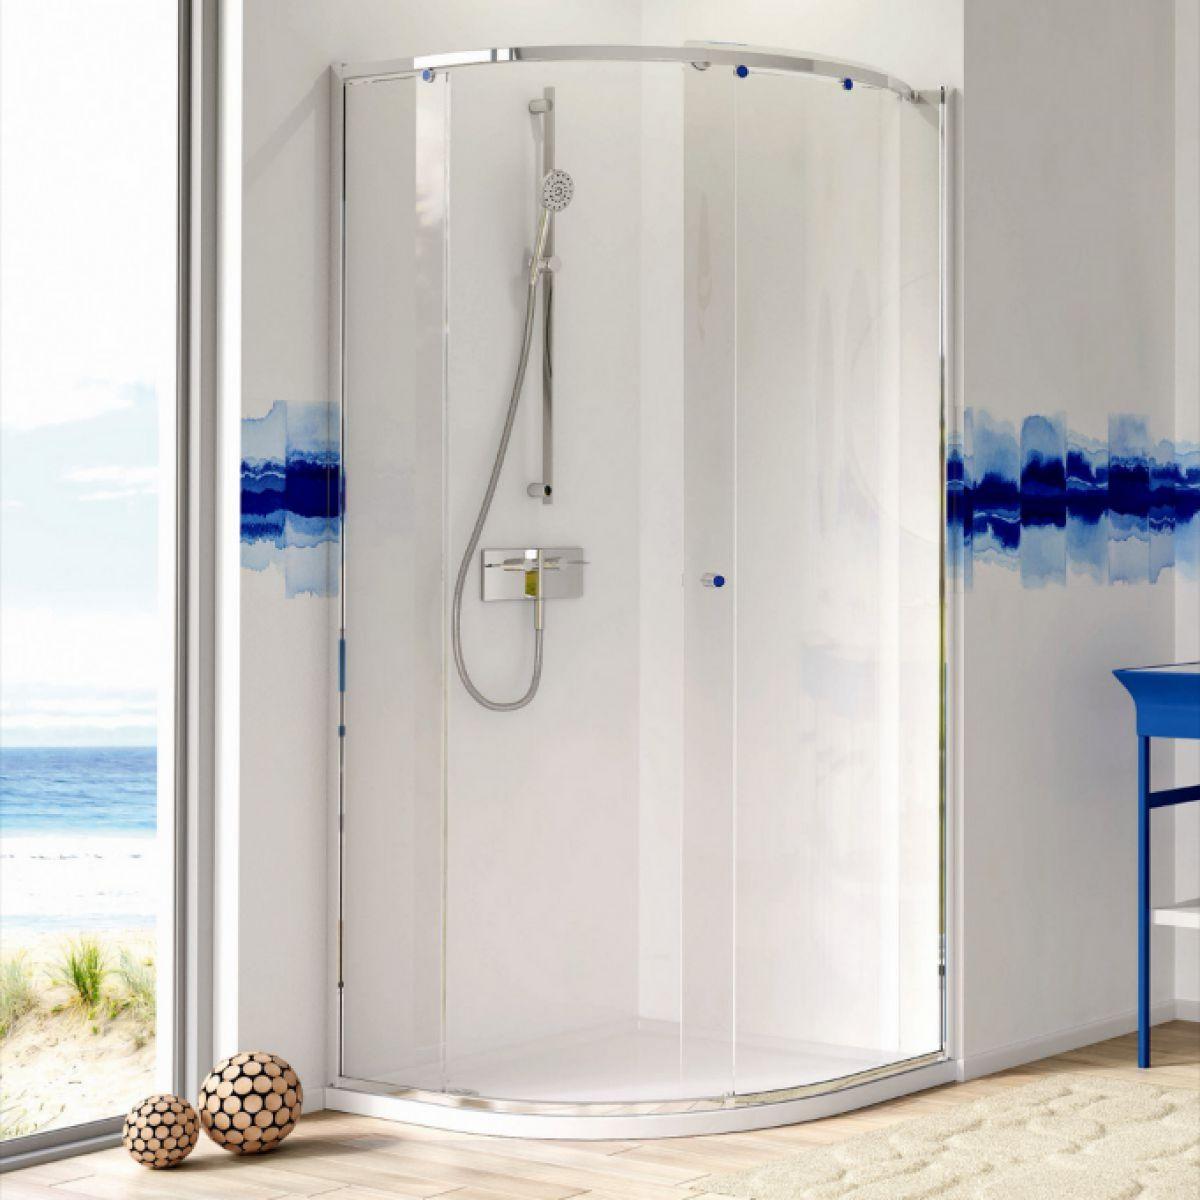 Matki-One Curved Corner Shower Enclosure : UK Bathrooms